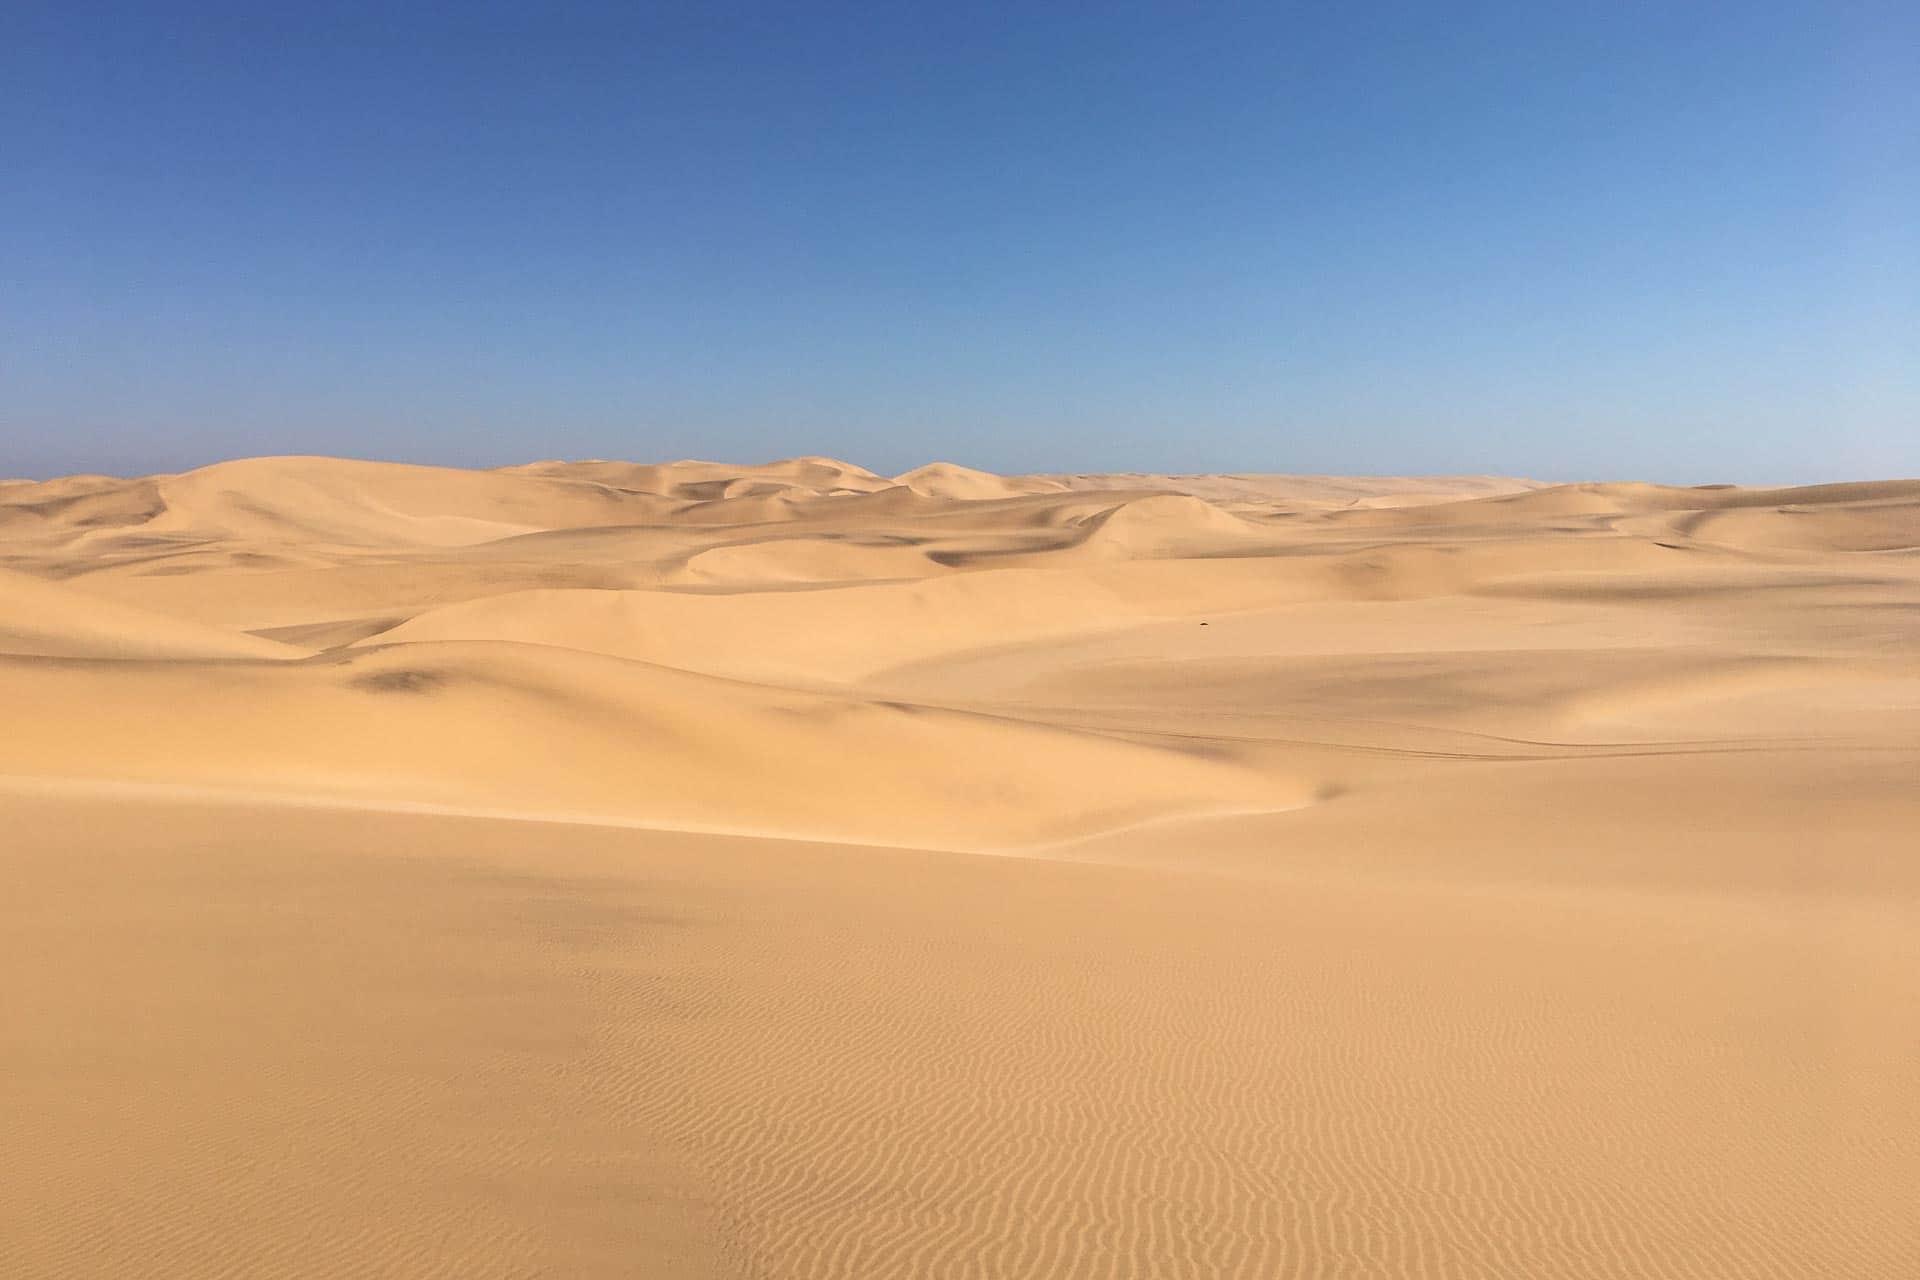 Living-Desert-Tour-Swakopmund-Namibia-Globetrotter-Select-18